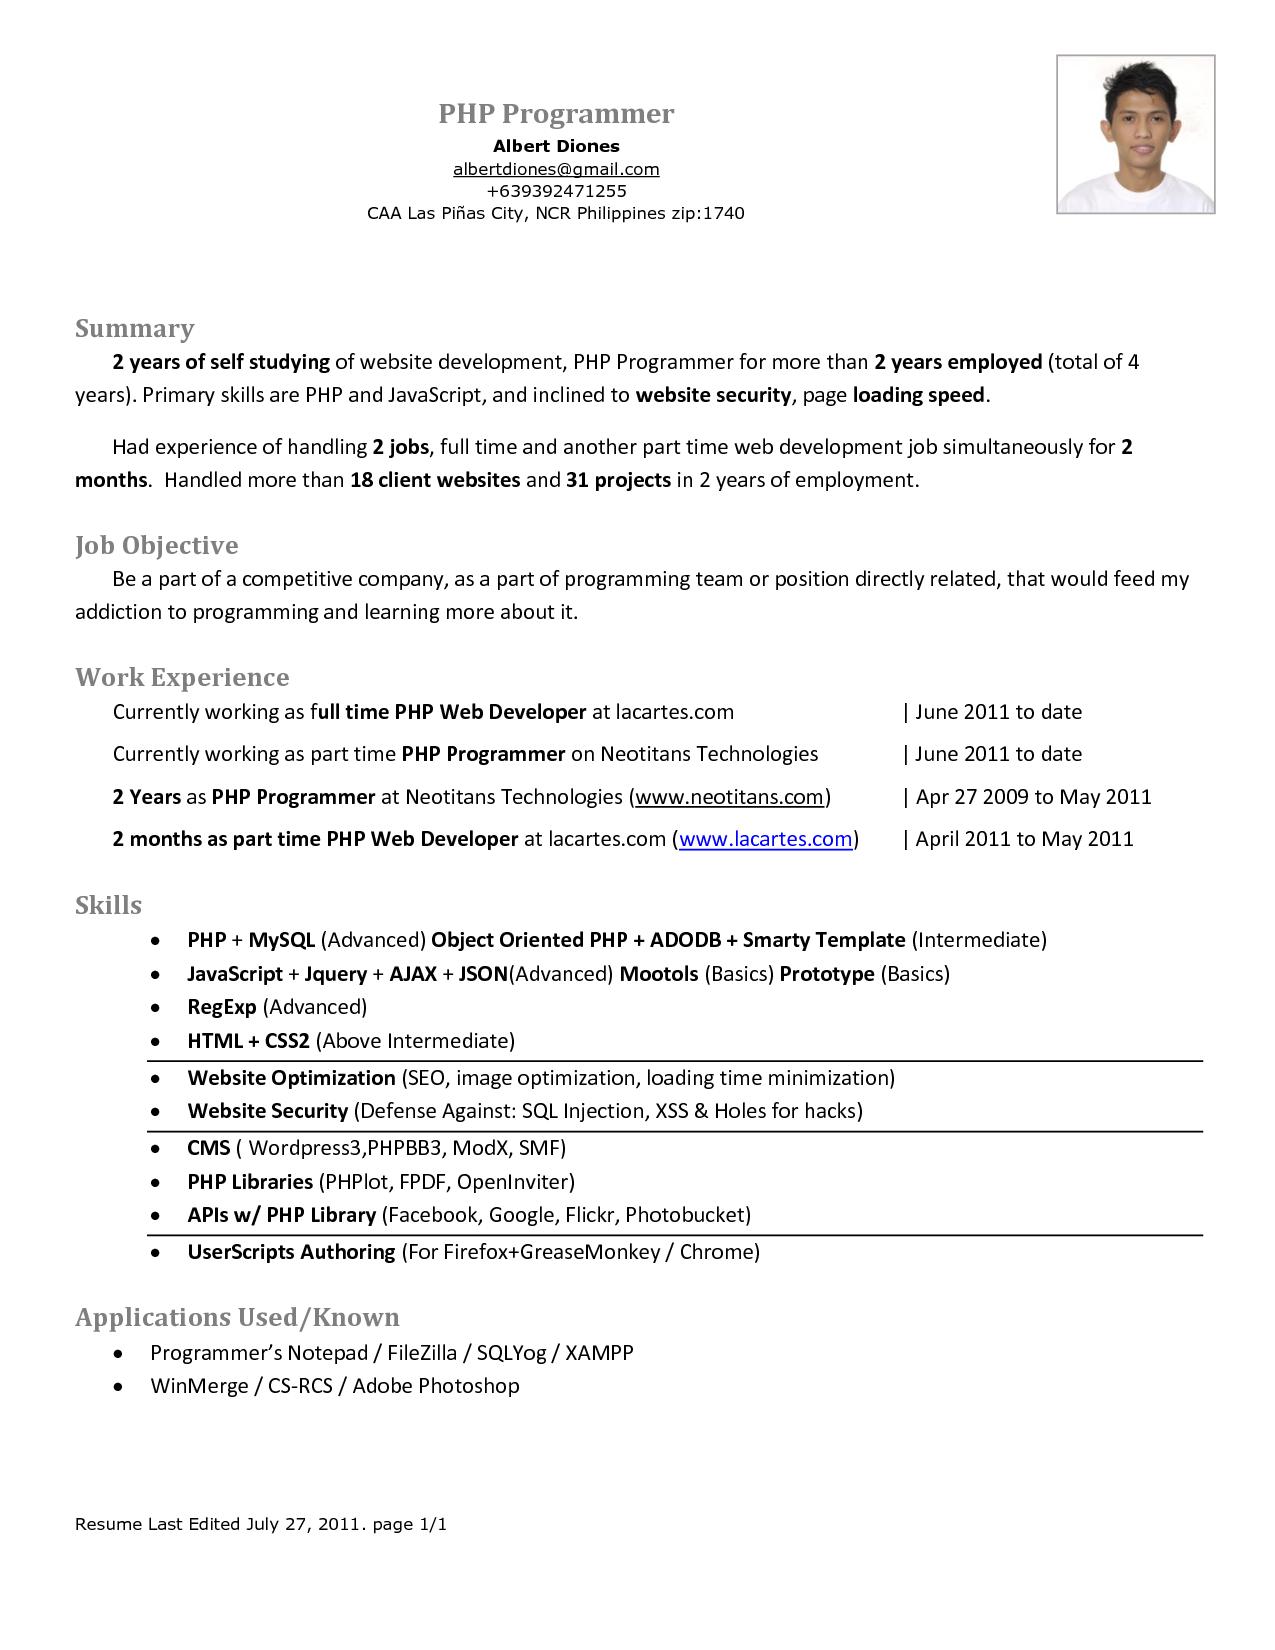 Simple Objective For Resume Php Programmer Resume  Httpwwwresumecareerphp